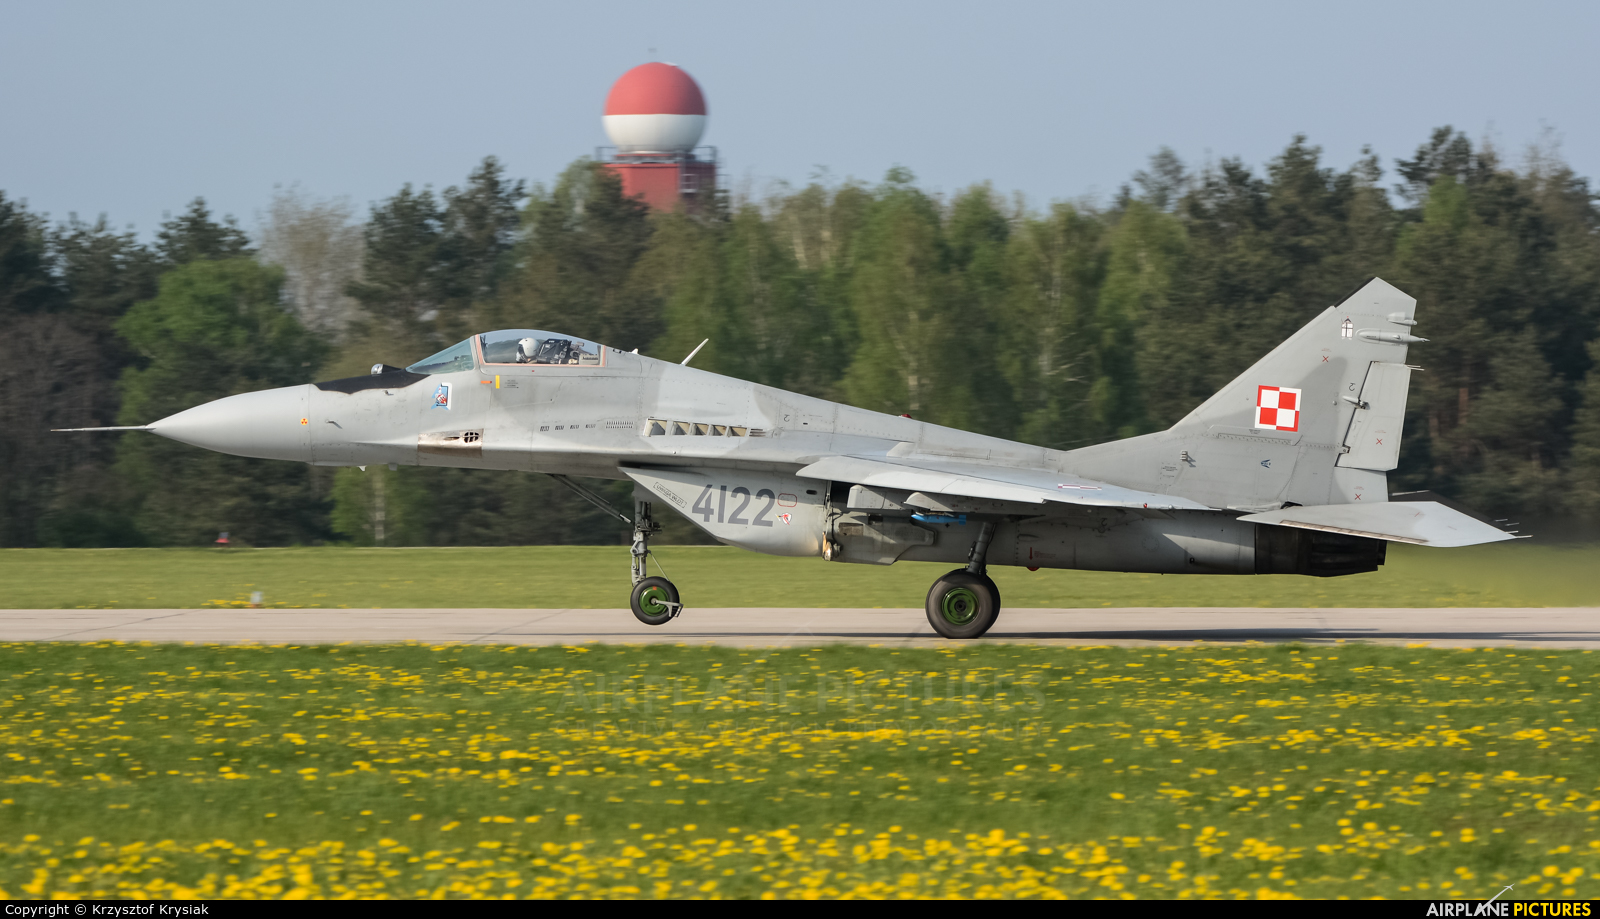 Poland - Air Force 4122 aircraft at Świdwin